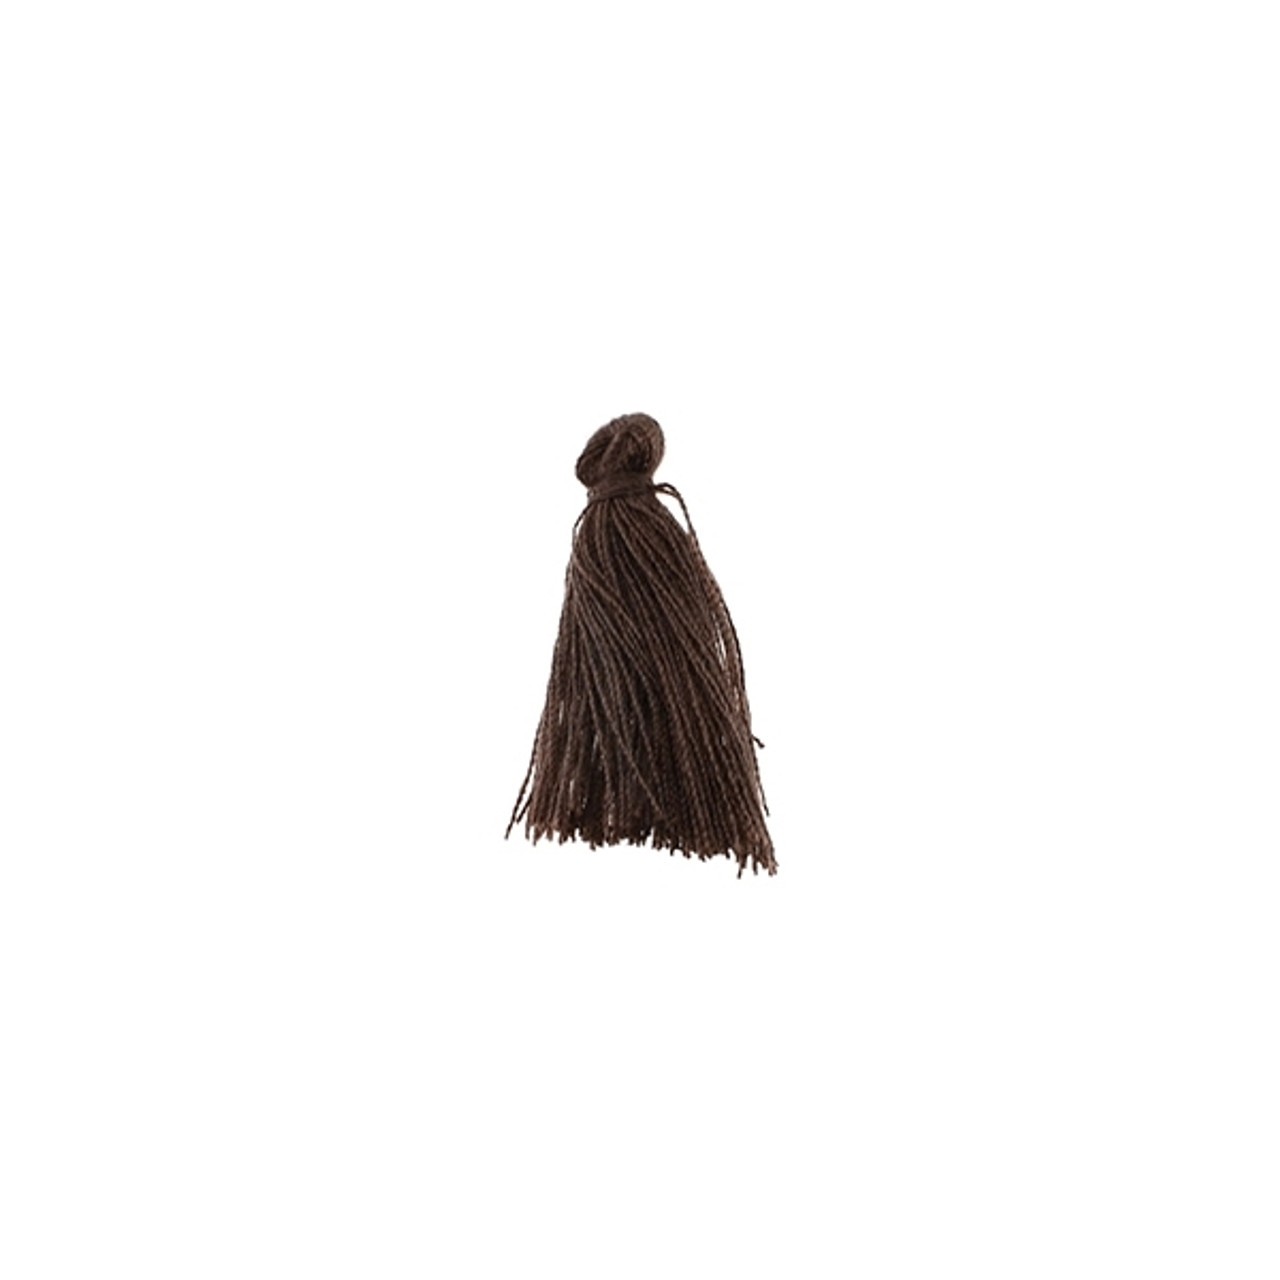 6pcs Mini Brown Thread Tassel with Gold Cap  gold plated cap  cotton tassel  brown  3mm x 15mm  EBRG011-T